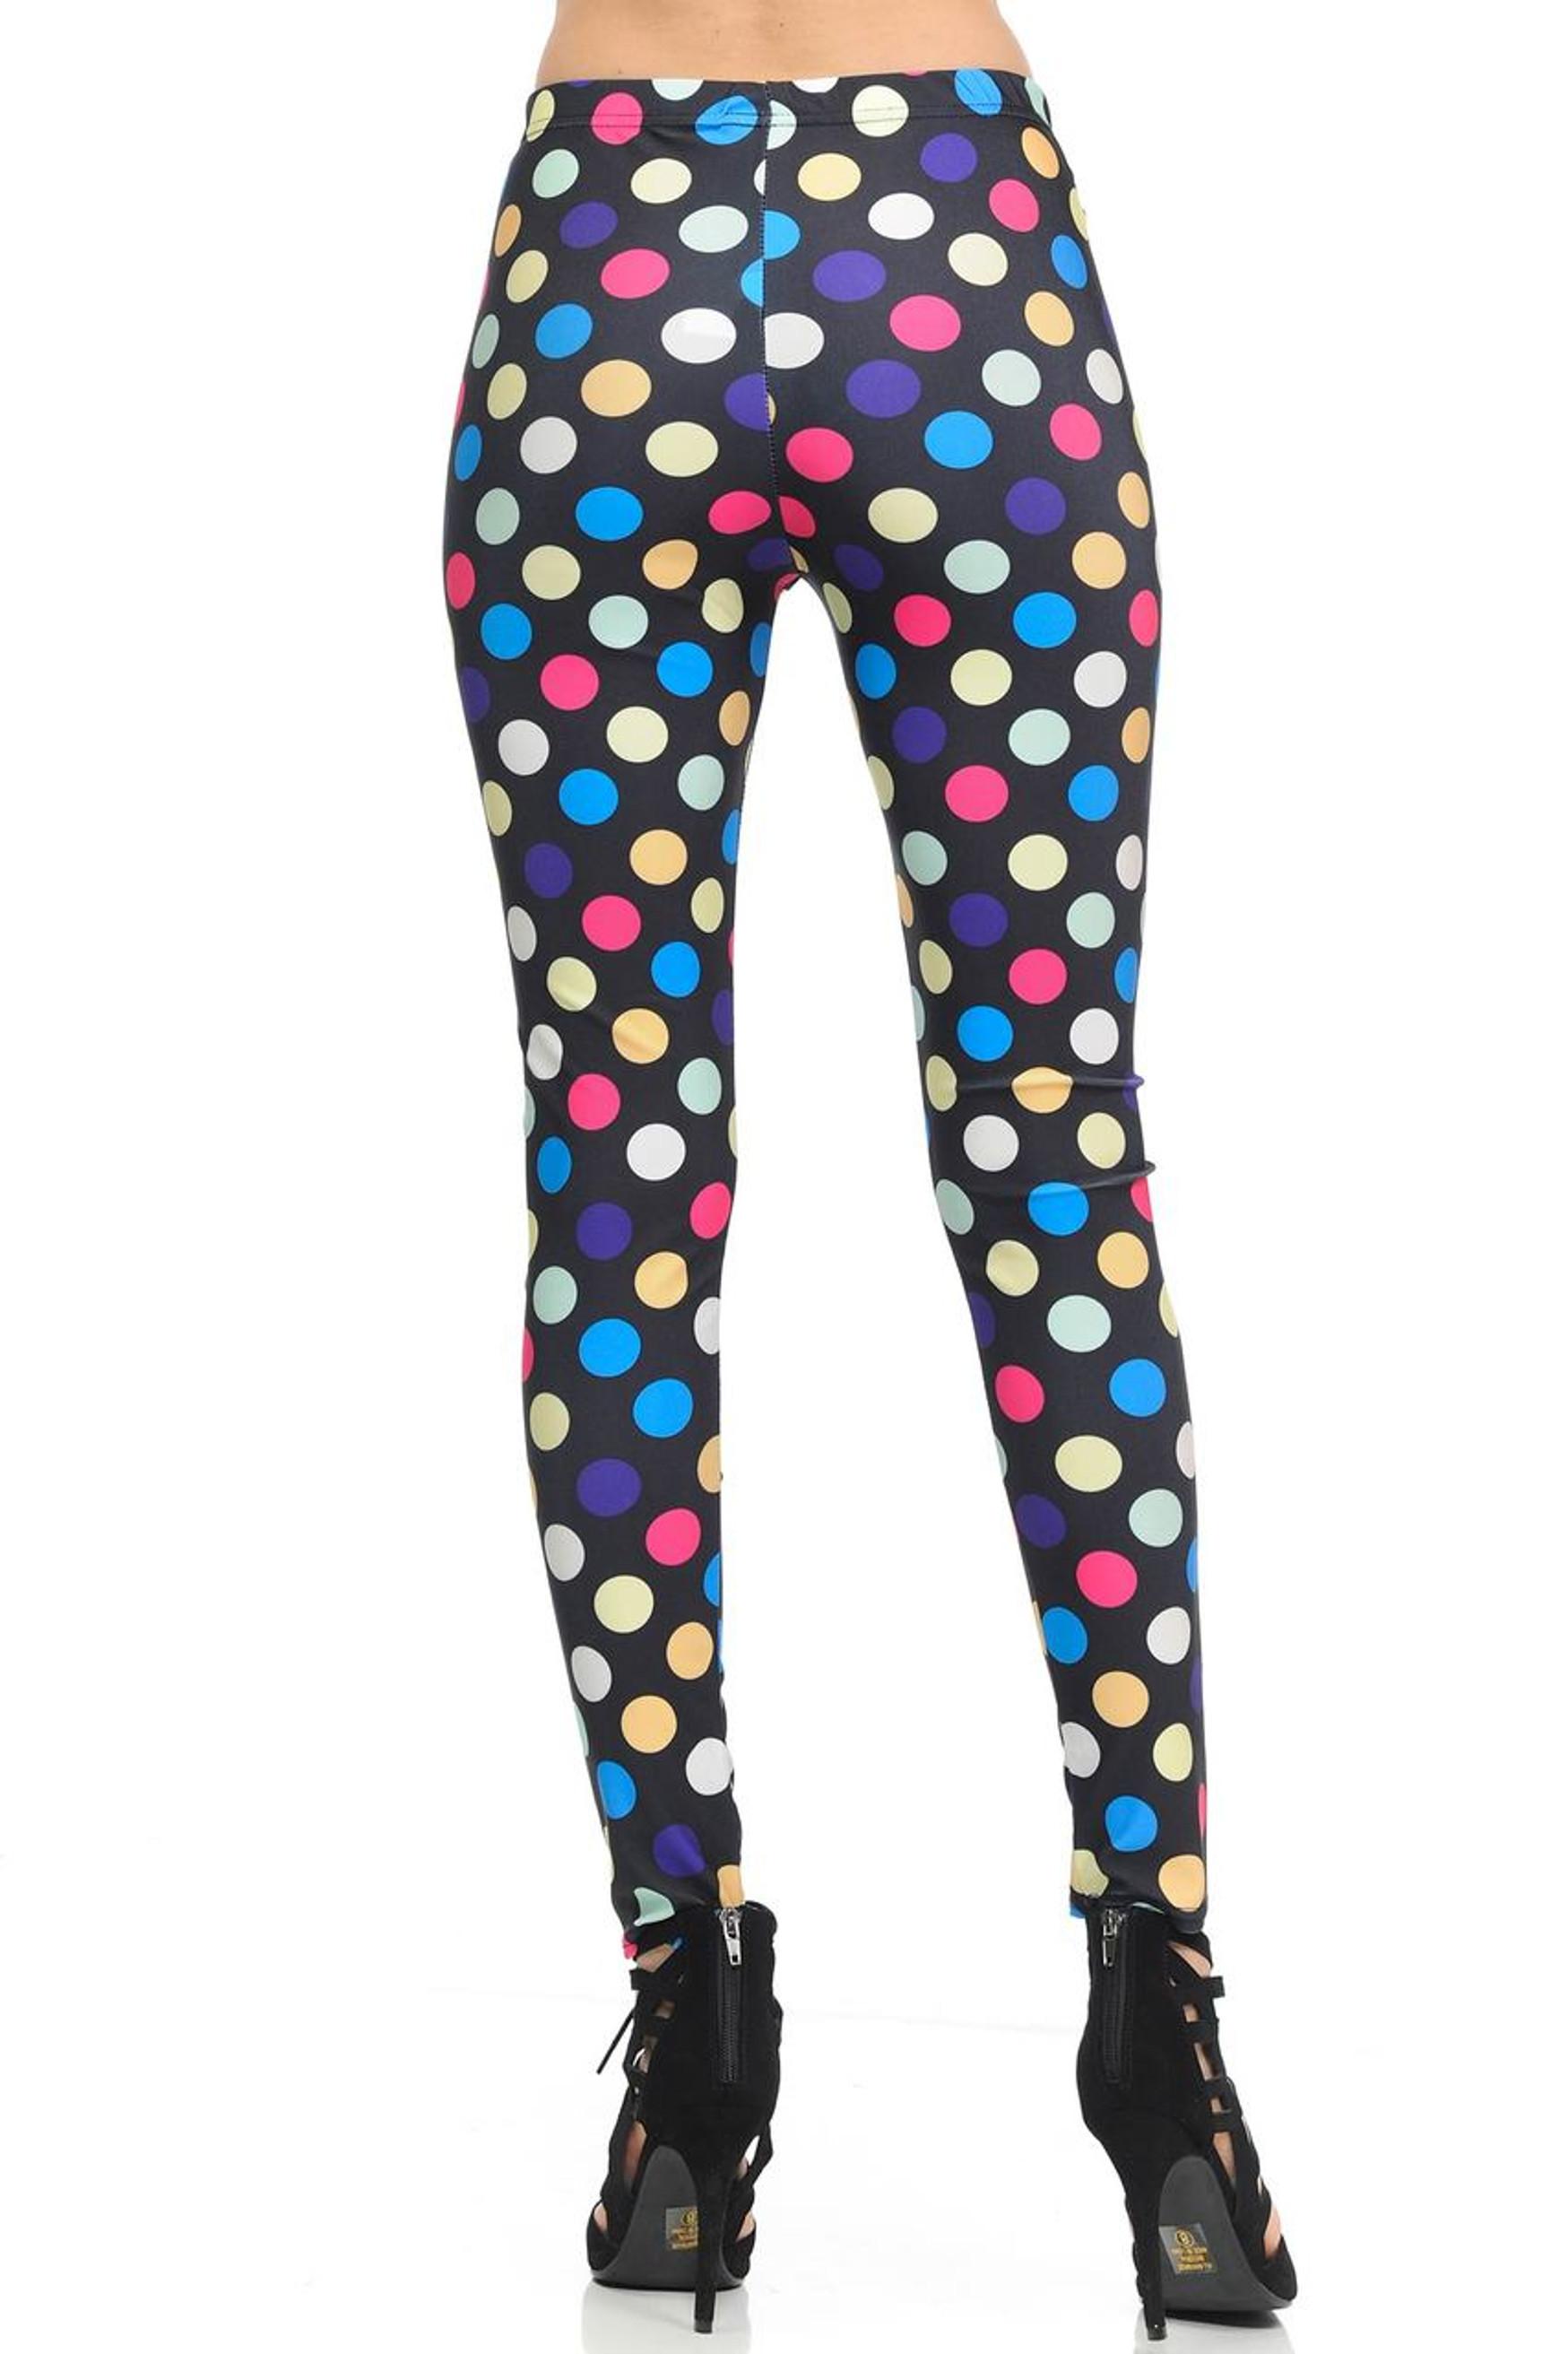 Colorful Jumbo Polka Dot Leggings